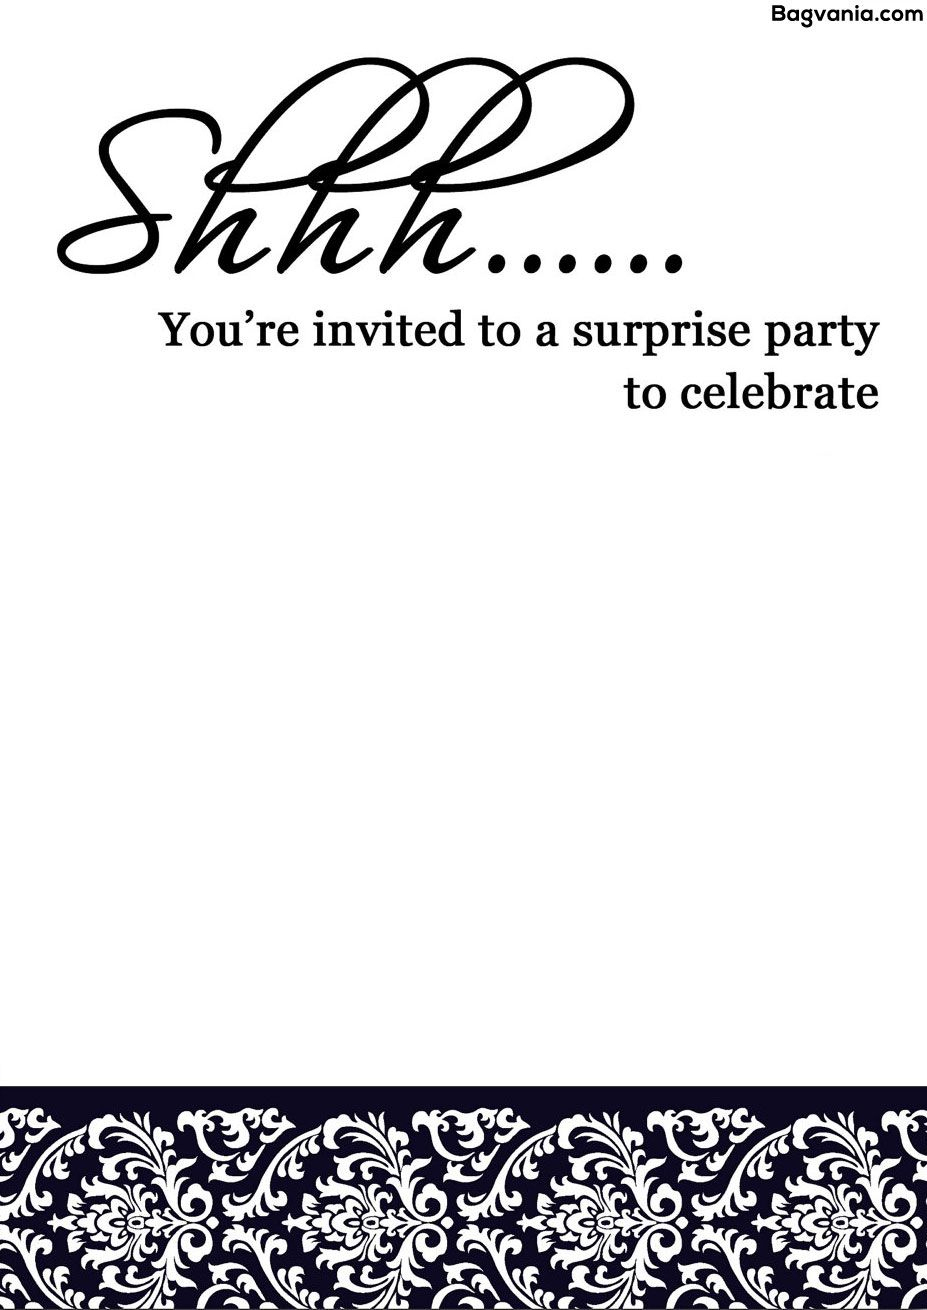 Free Printable Surprise Birthday Invitations – Bagvania Free - Free Printable Golf Stationary